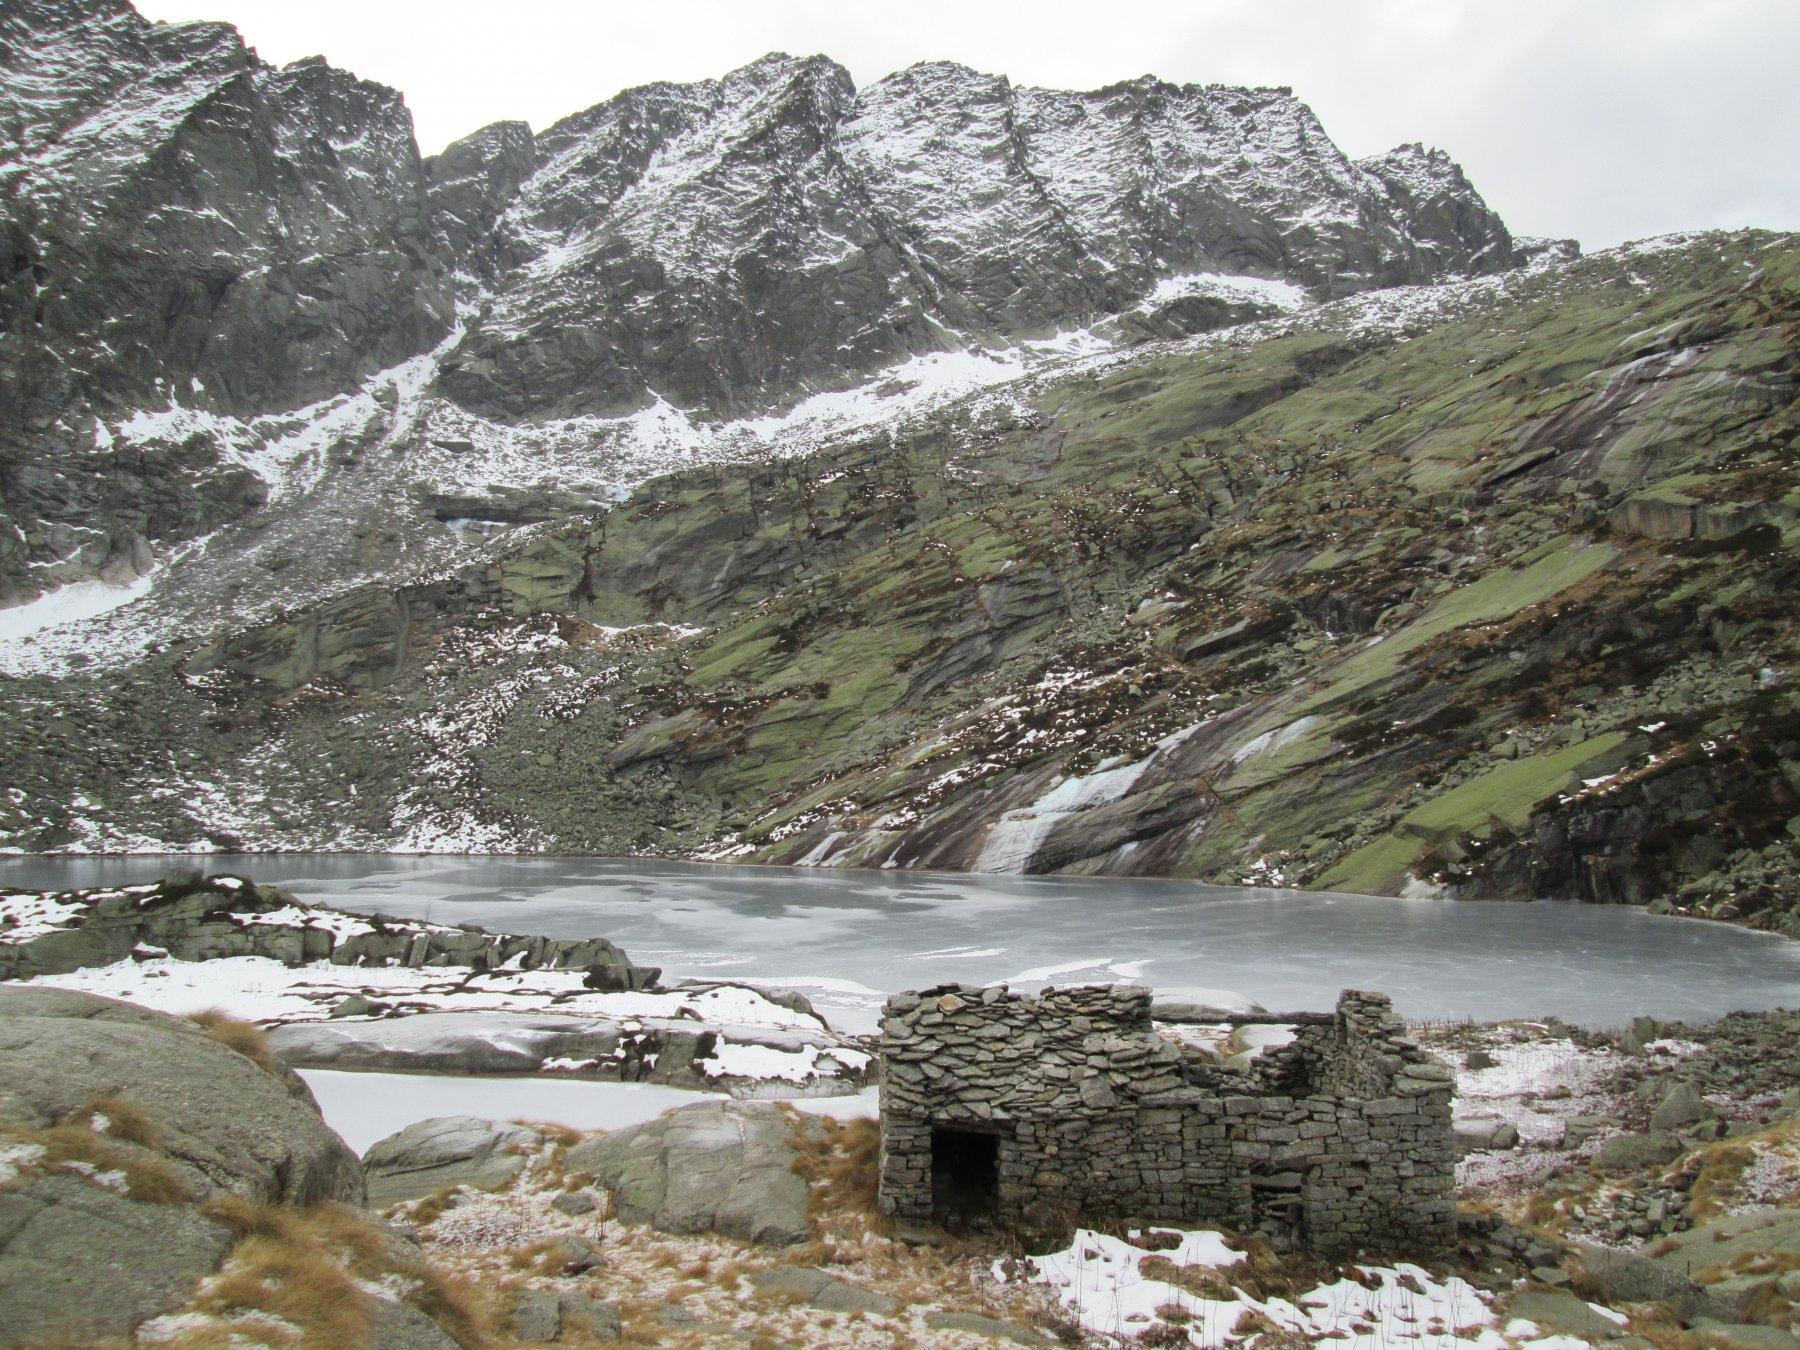 lago lasin ghiacciato